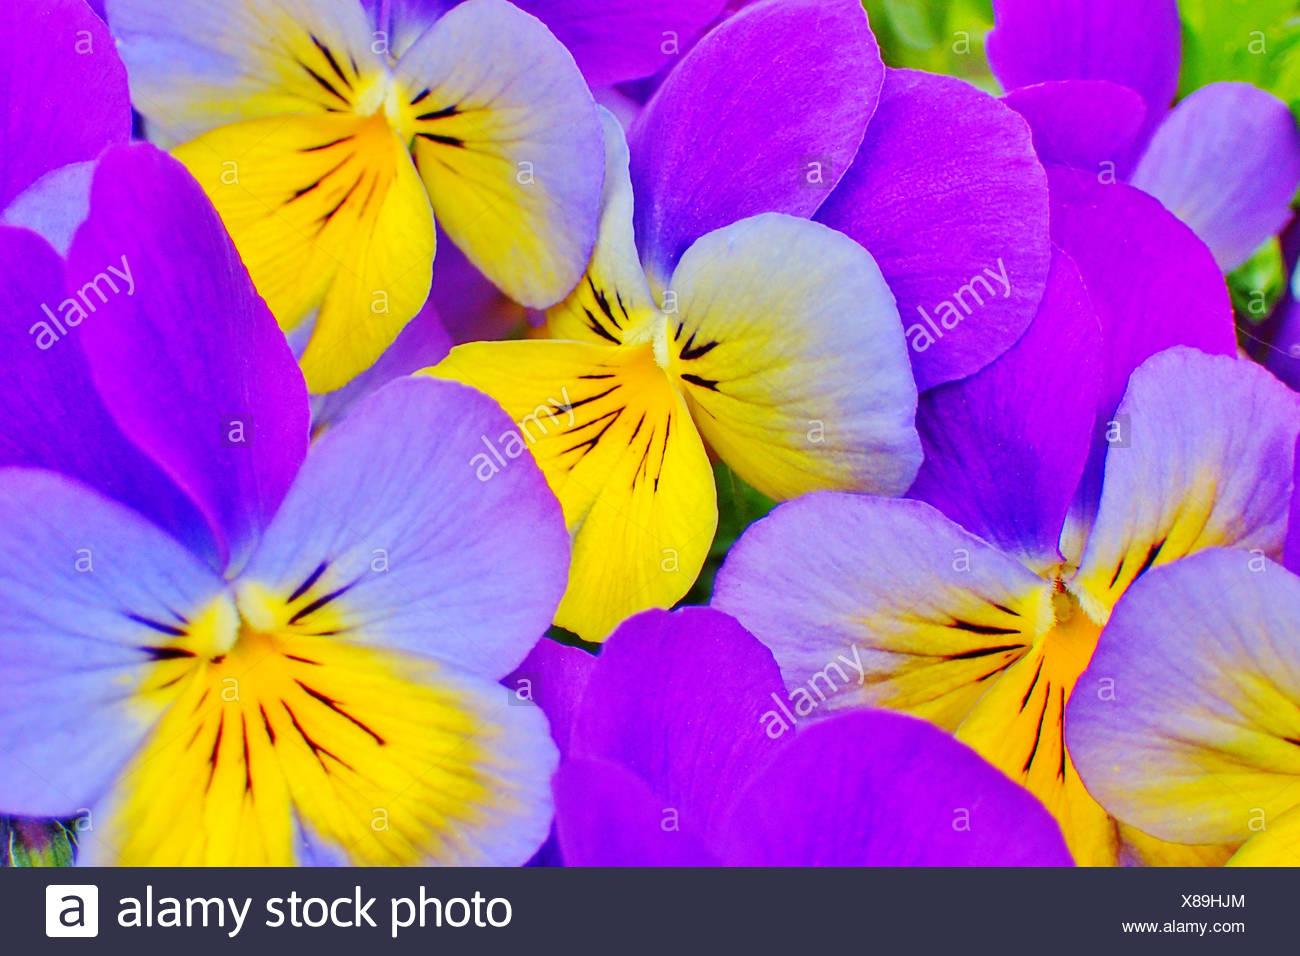 horned pansy,viola cornuta - Stock Image